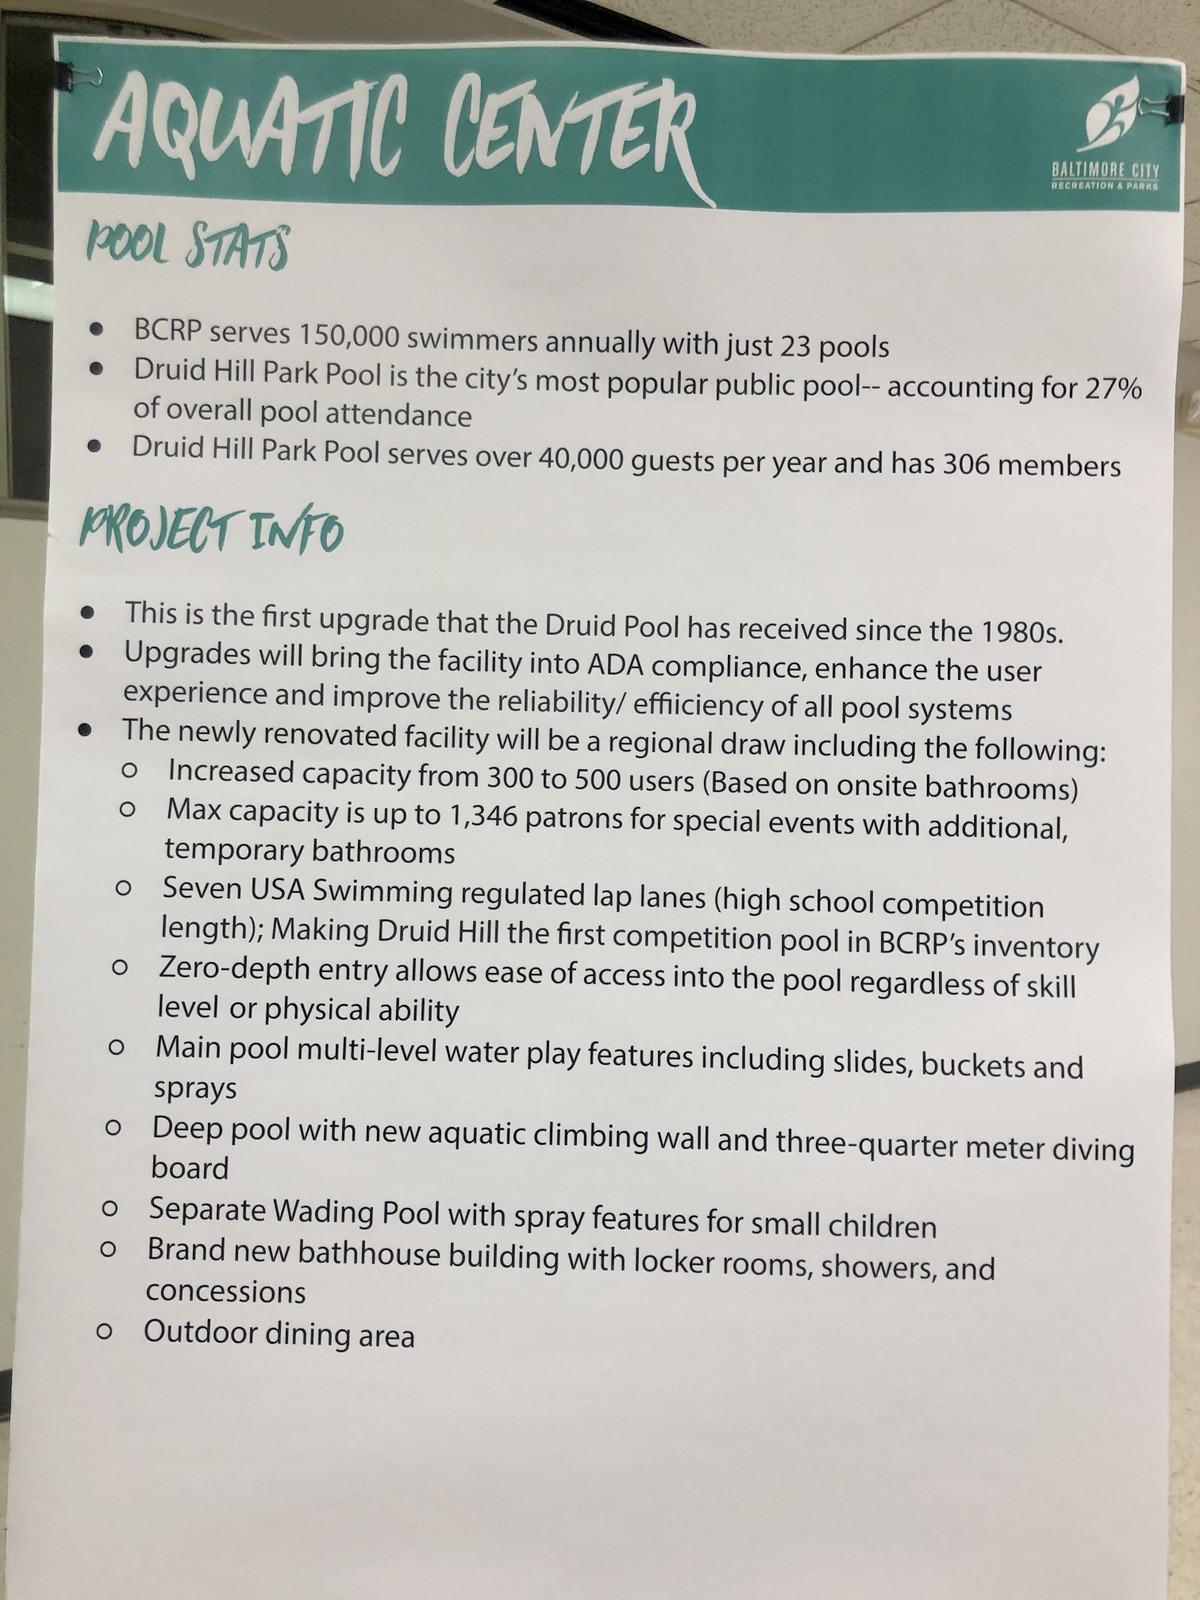 druid park aquatic center information